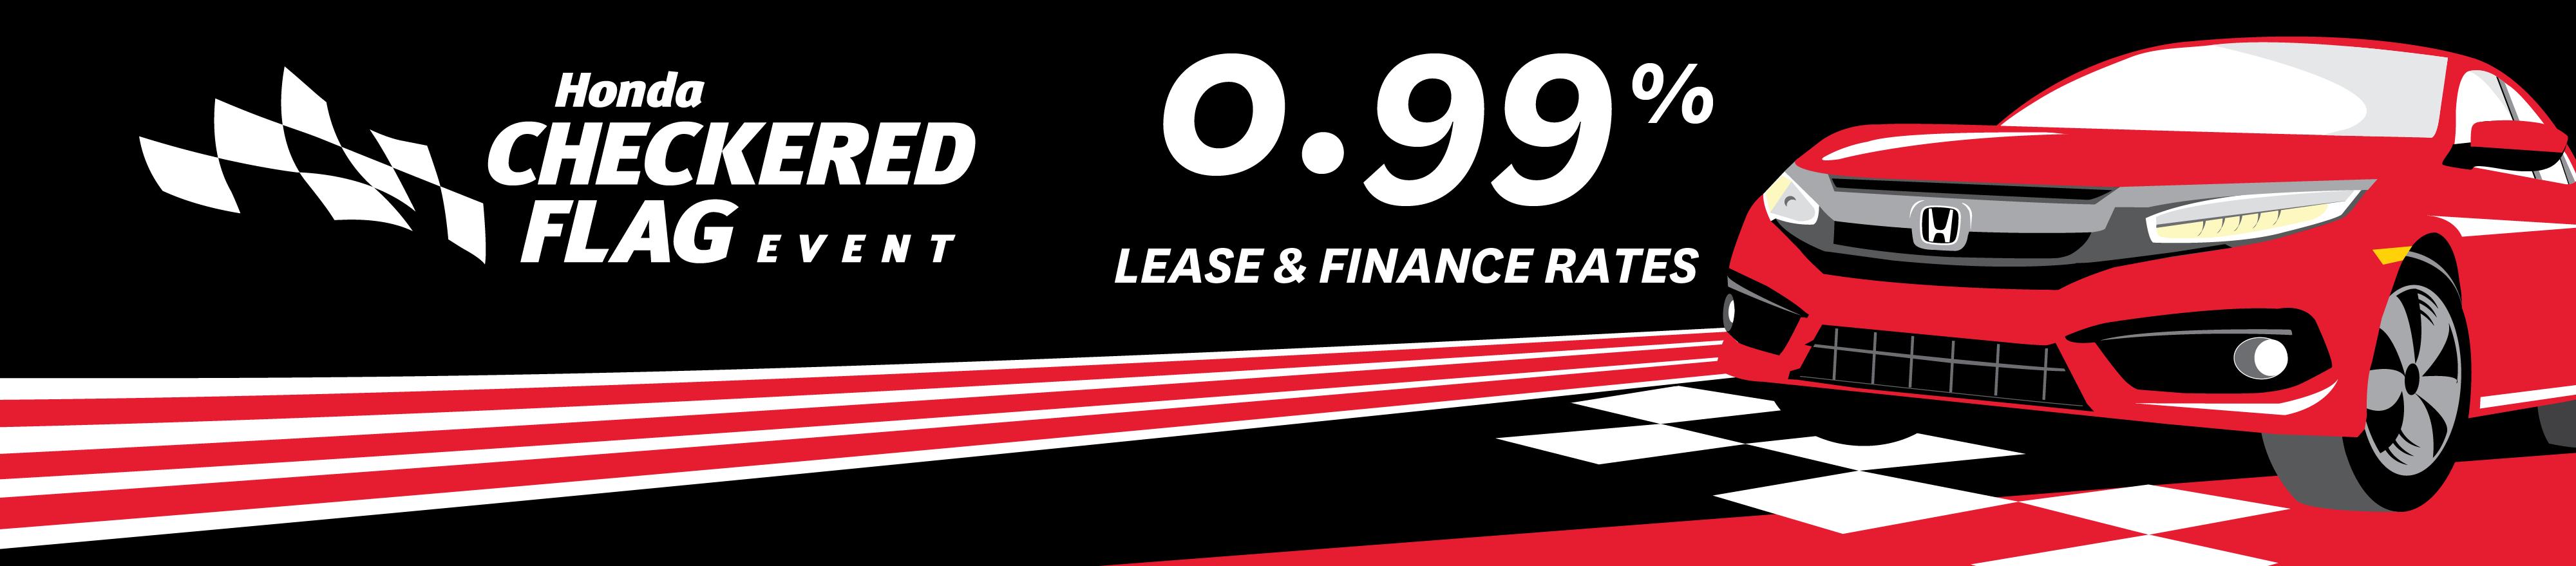 finance rates starting at 0.99 checkered flag Honda sales event